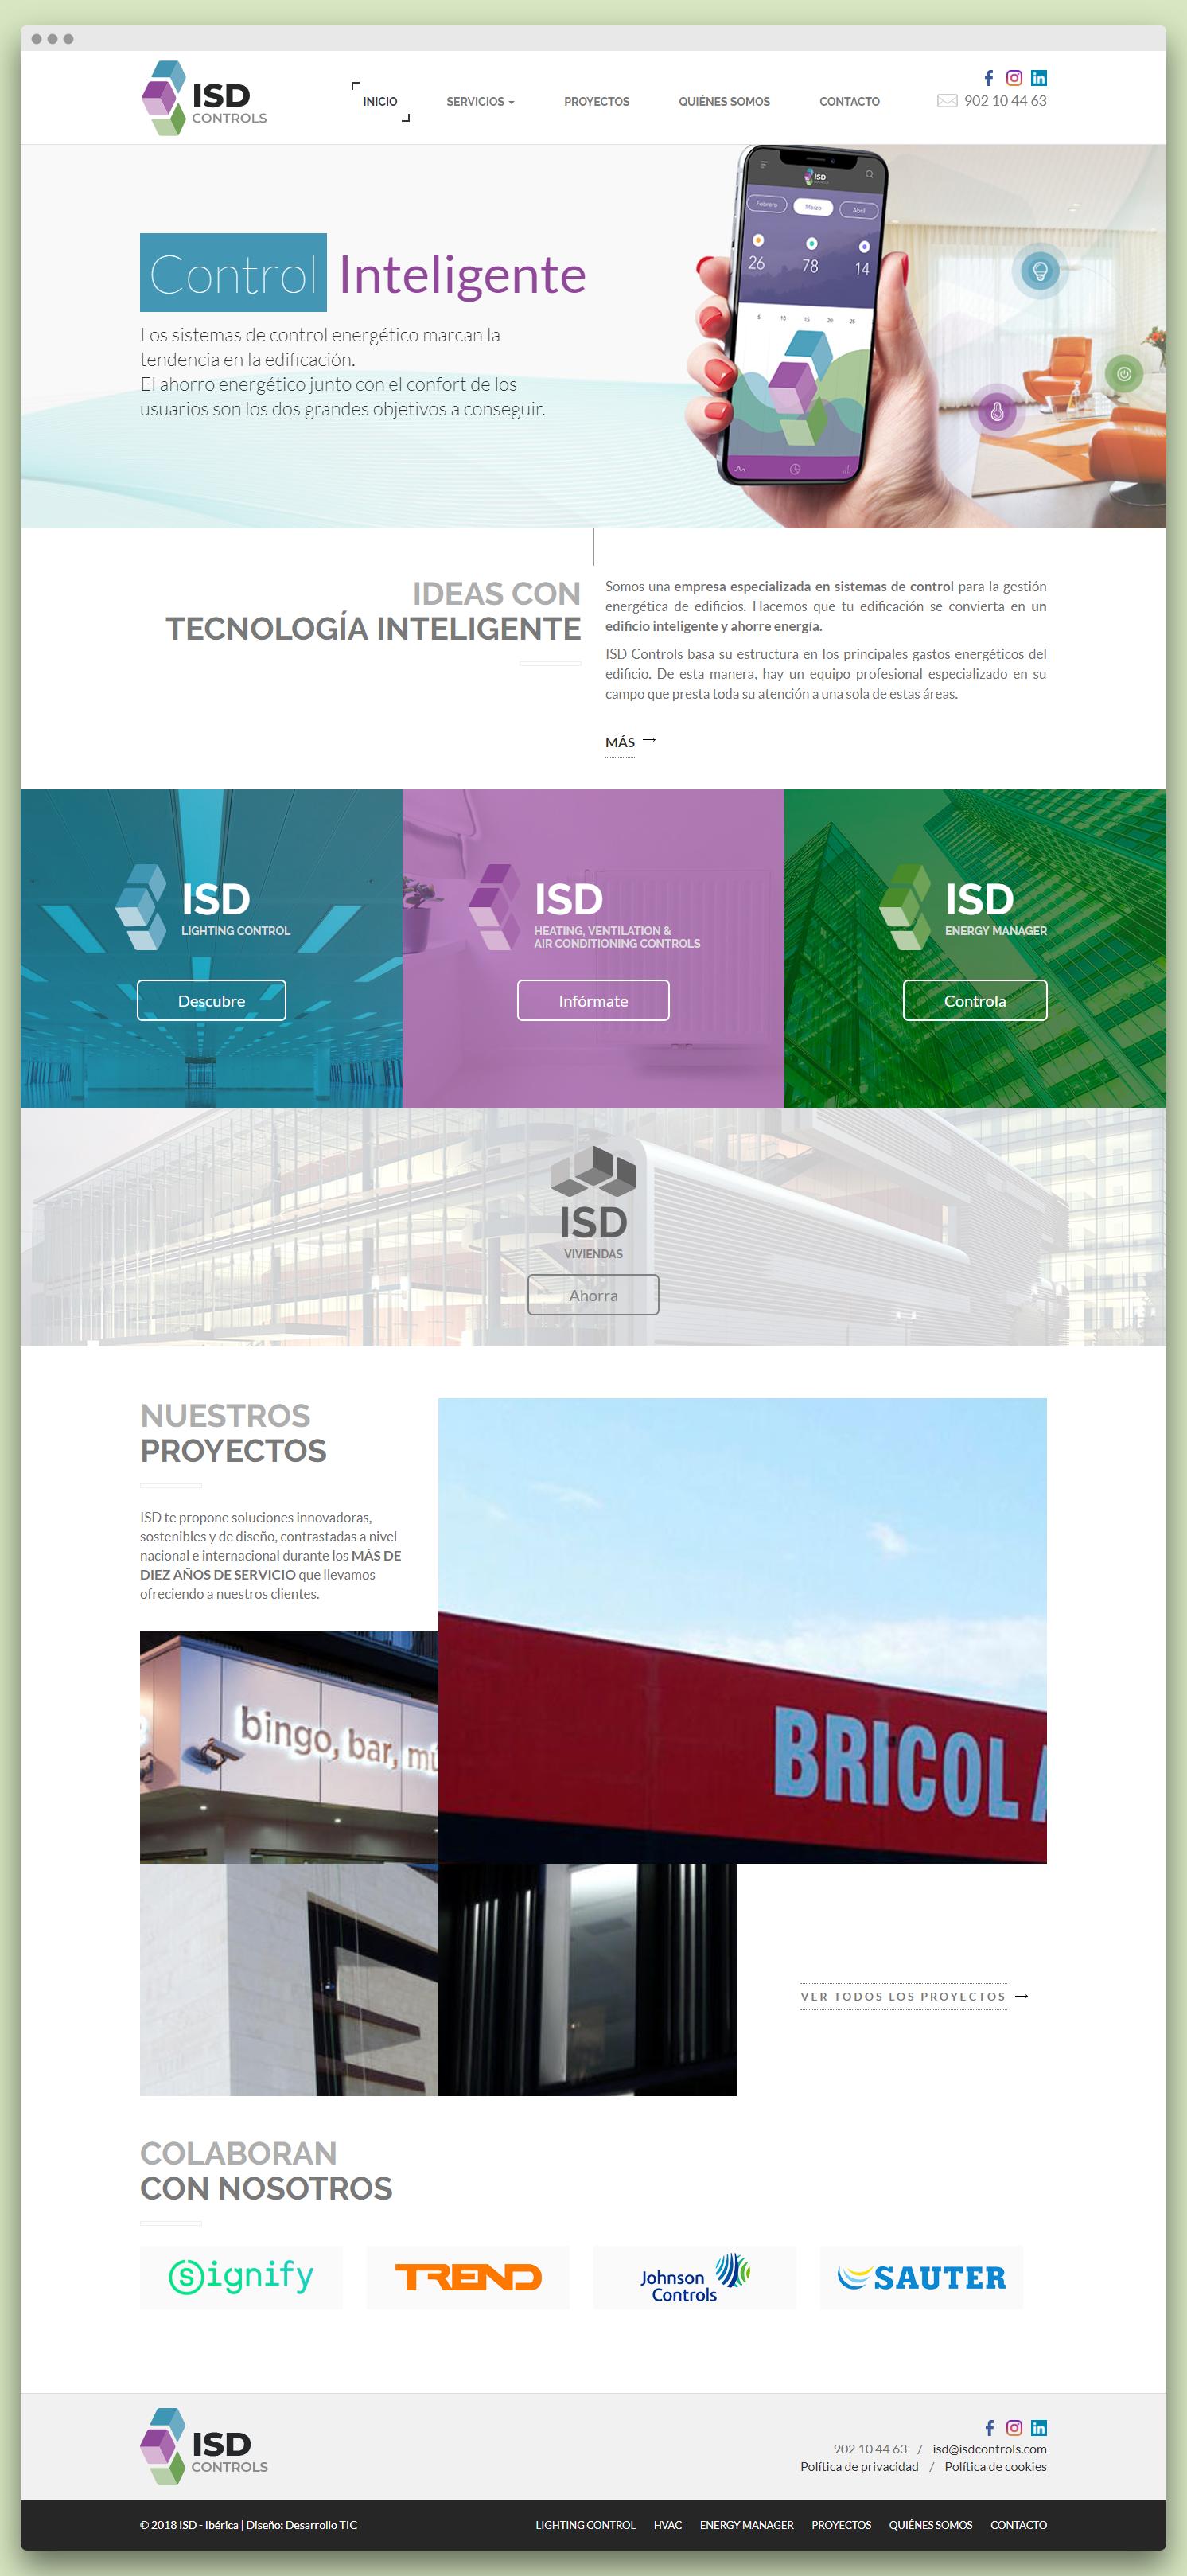 Imagen adicional 1 del proyecto ISD Controls